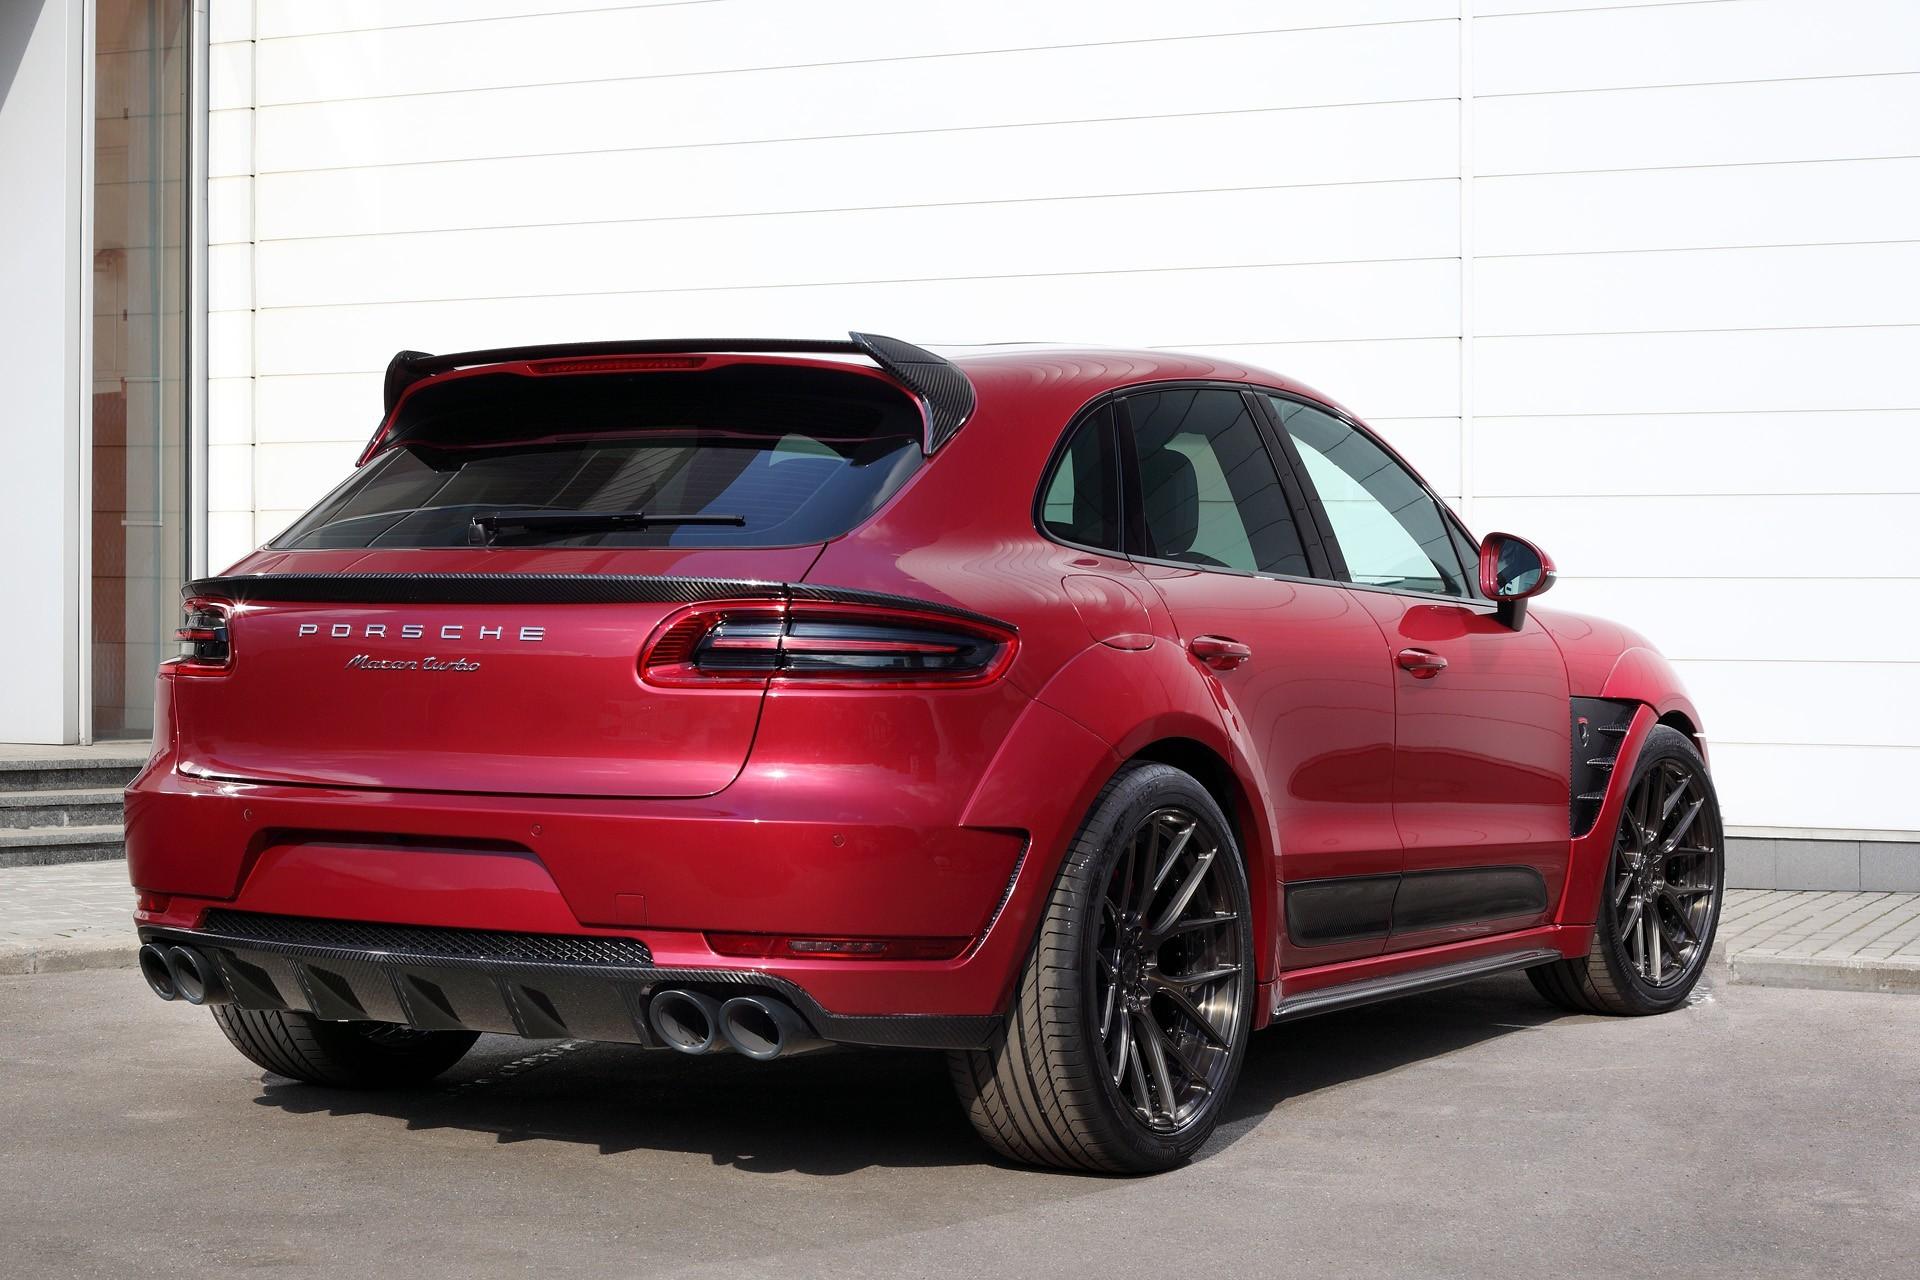 Обвес Topcar Design для Porsche Macan URSA